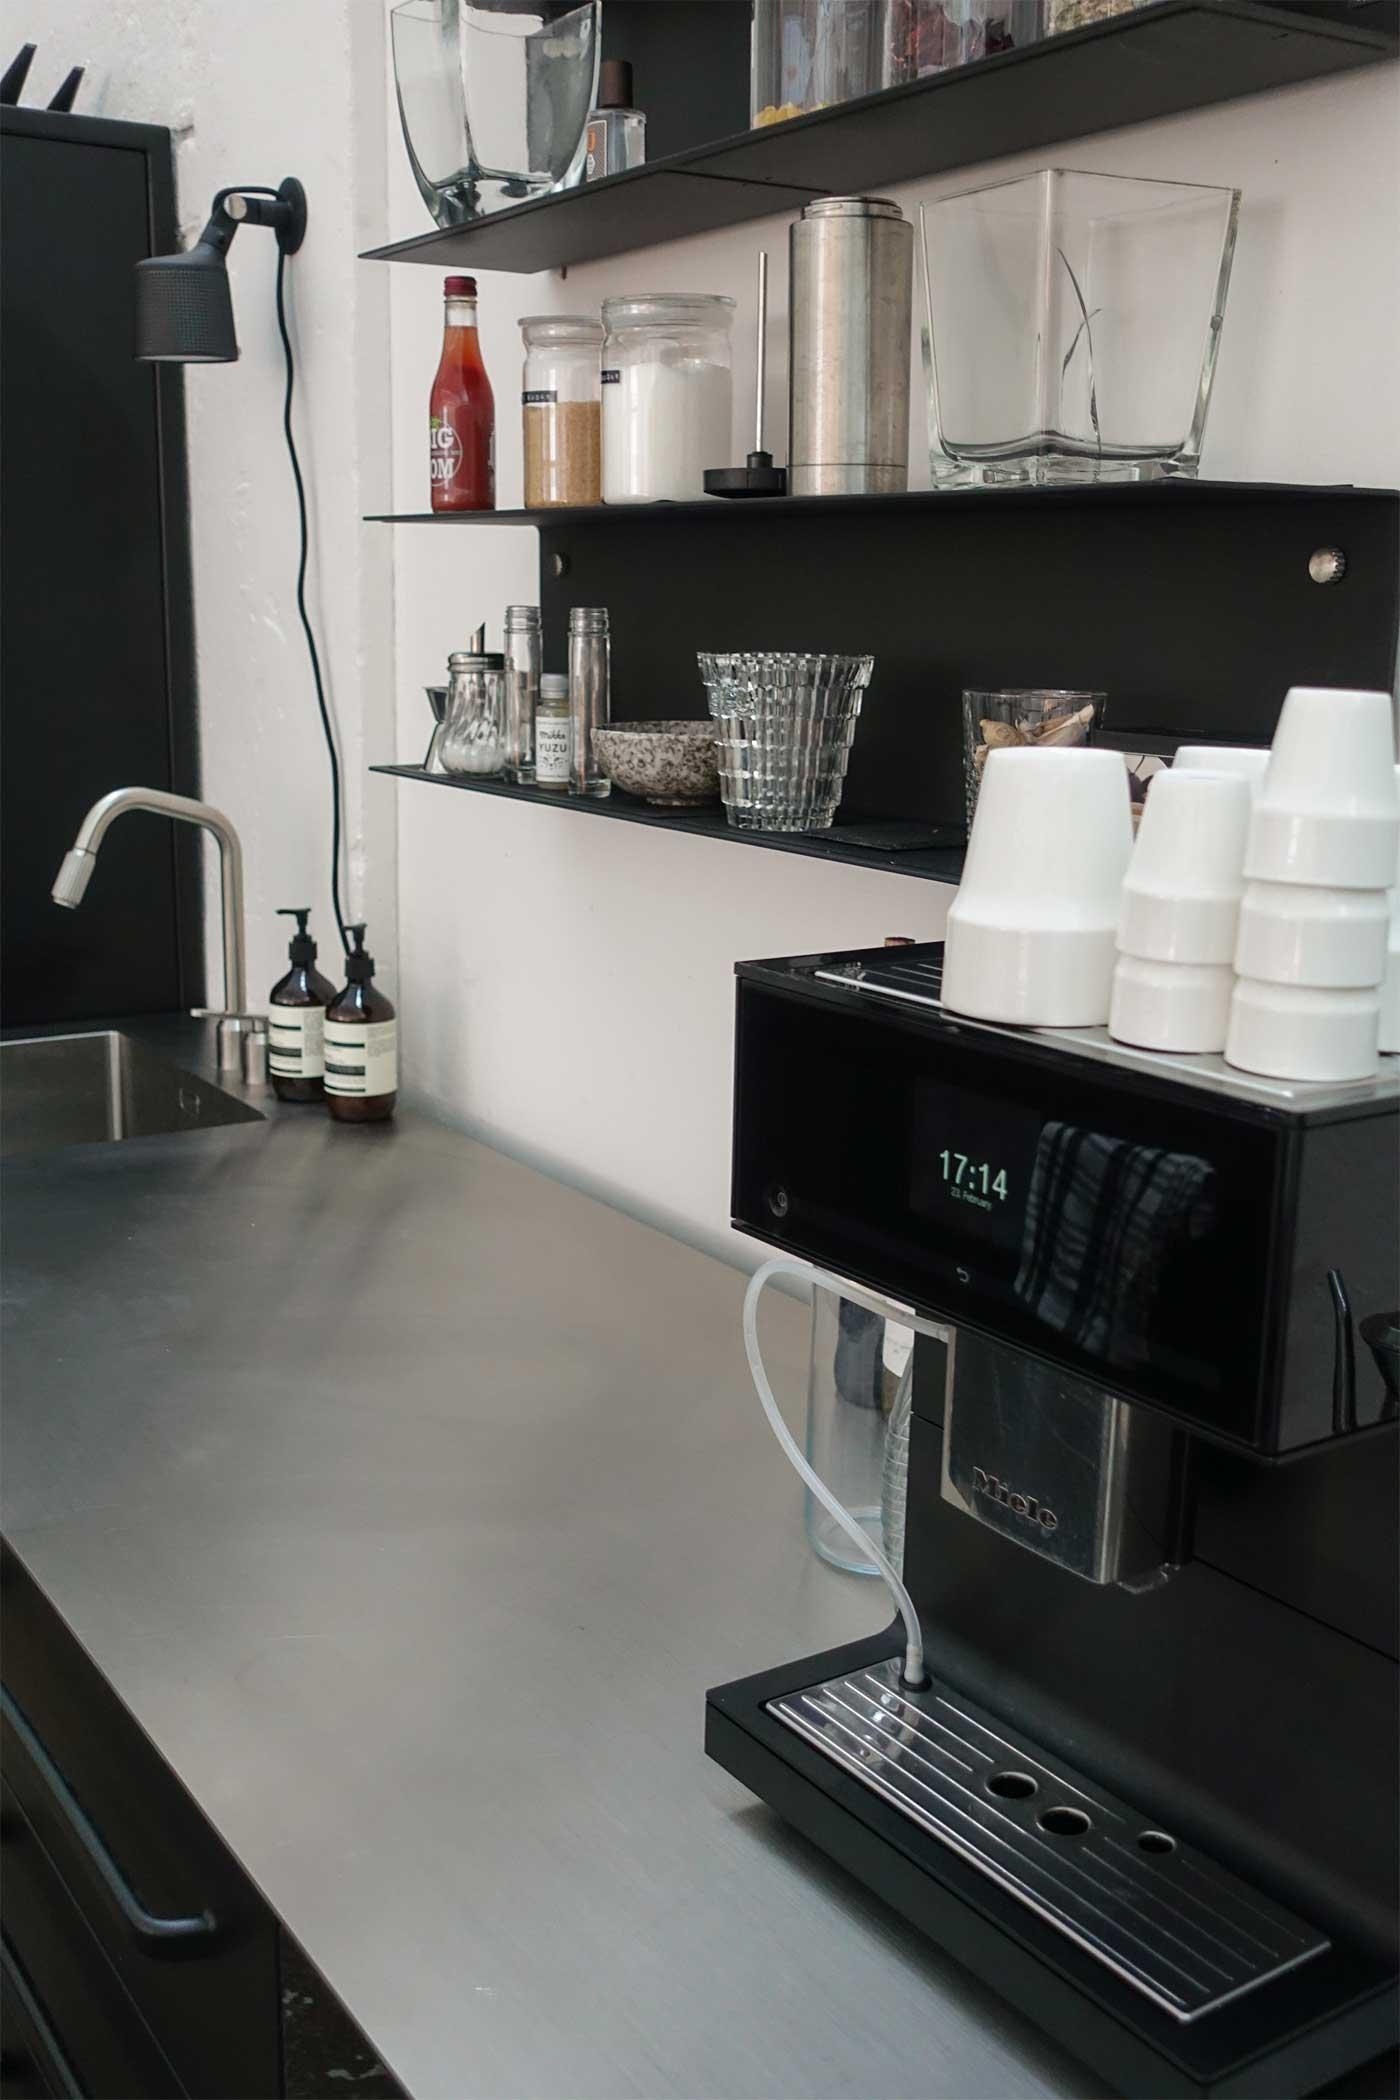 Miele Coffee Machine on Vipp Kitchen counter